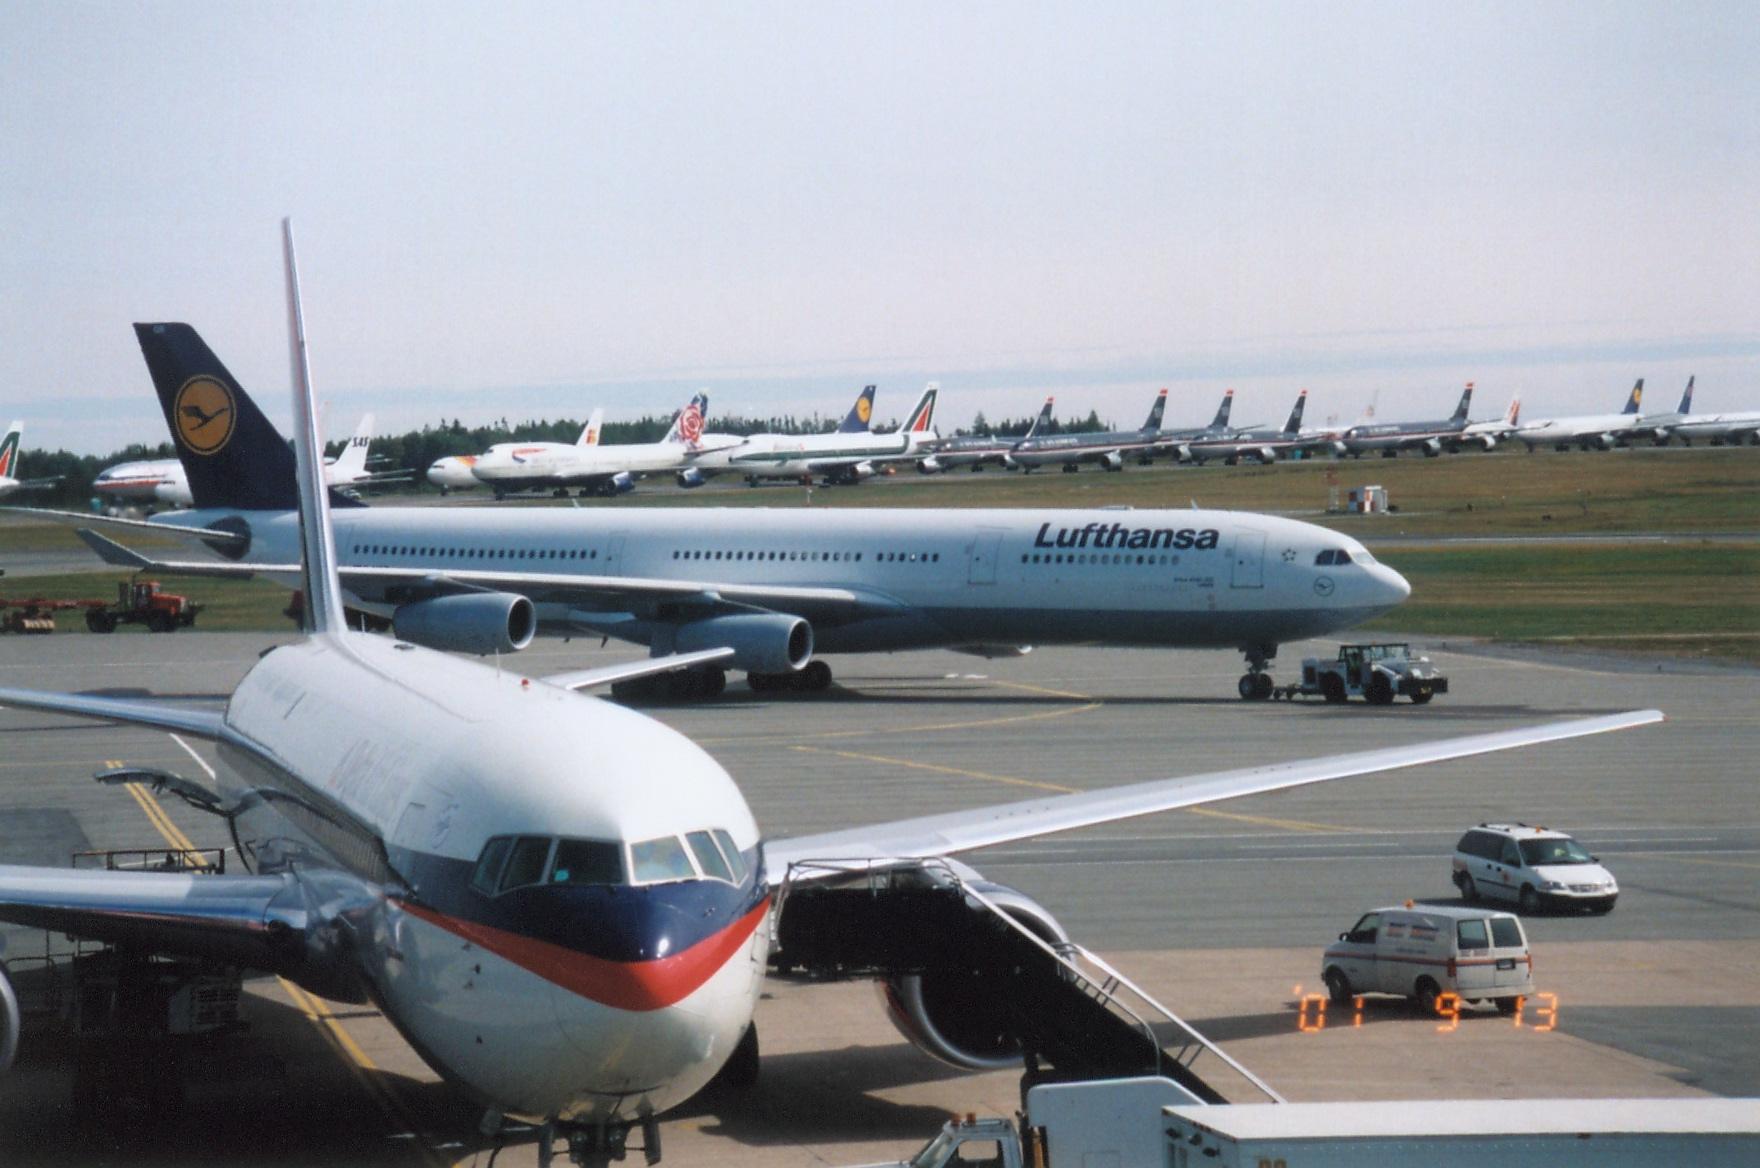 Diverted Aircraft, September 11, 2001